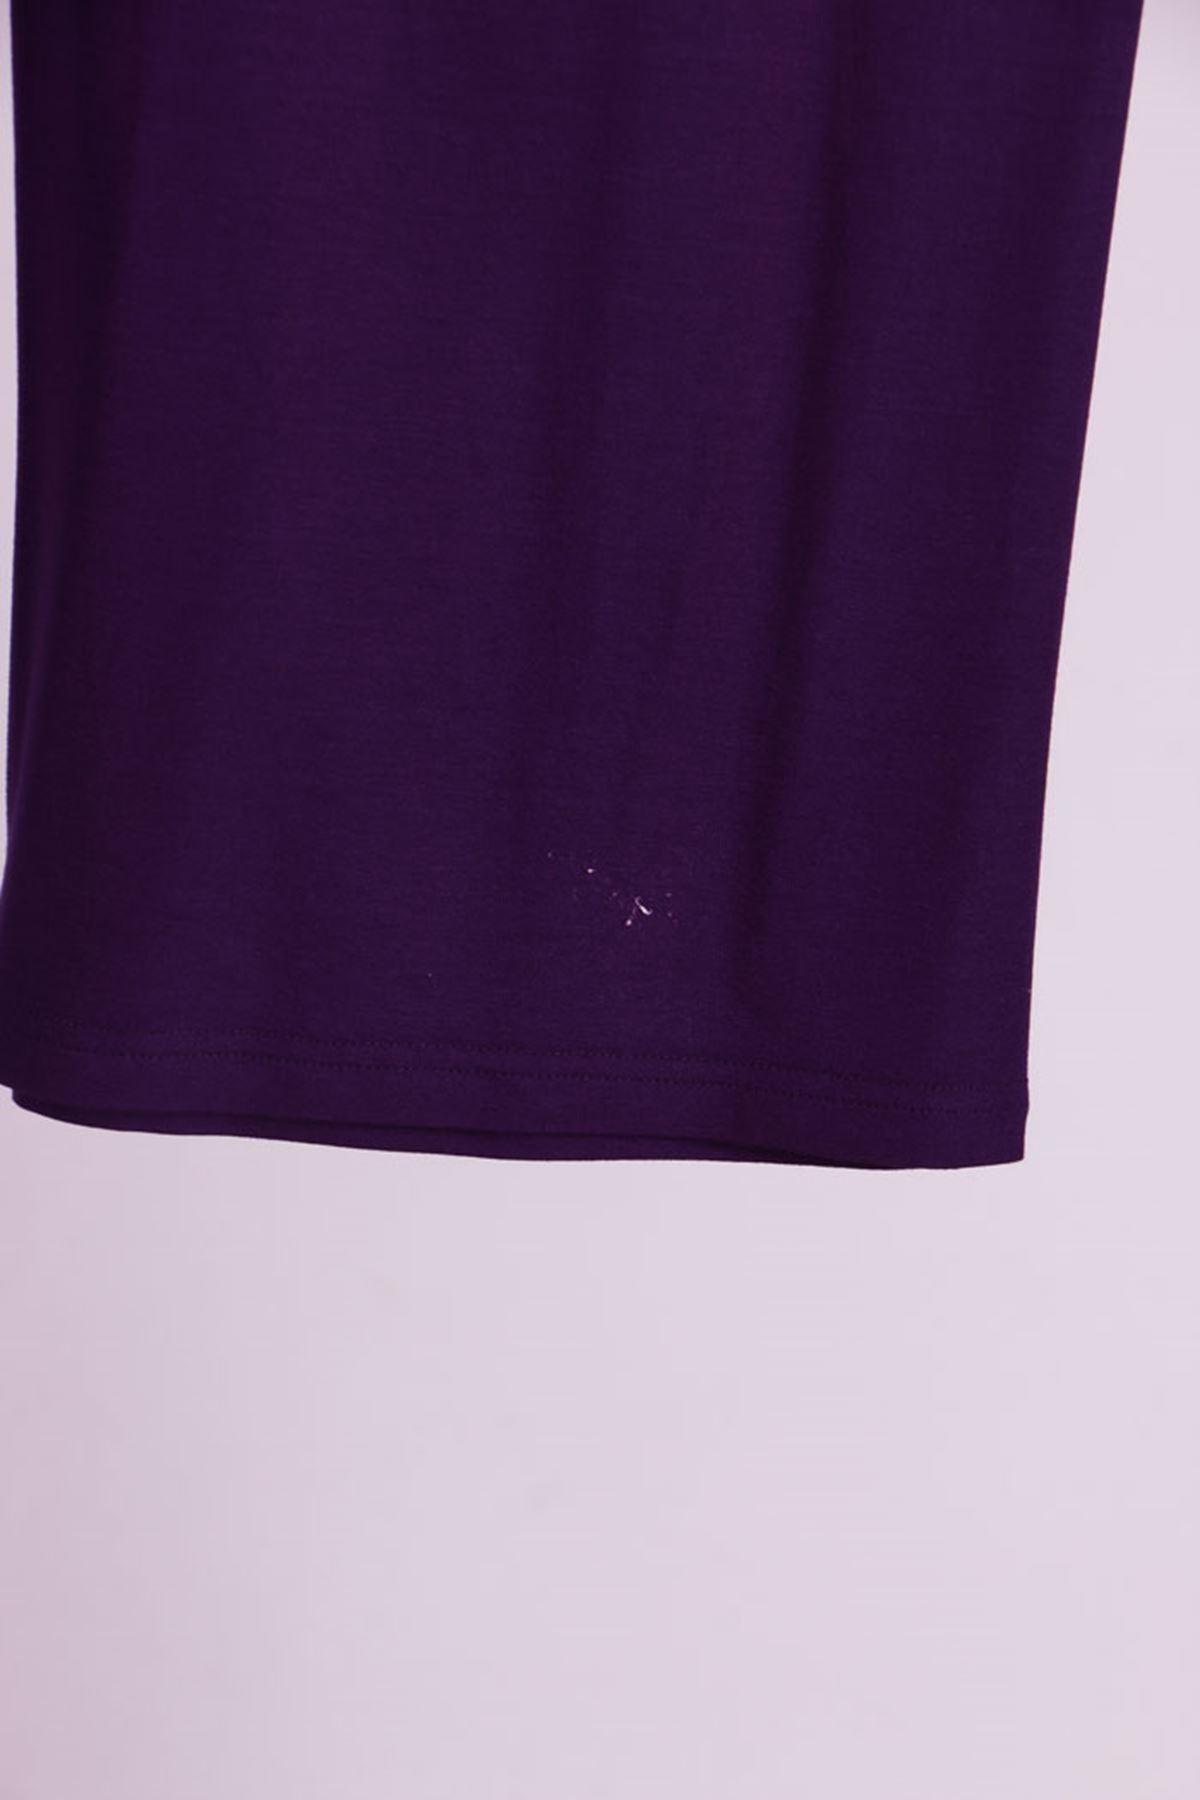 7598 Plus Size Tunic Pants Binary Suit- Purple